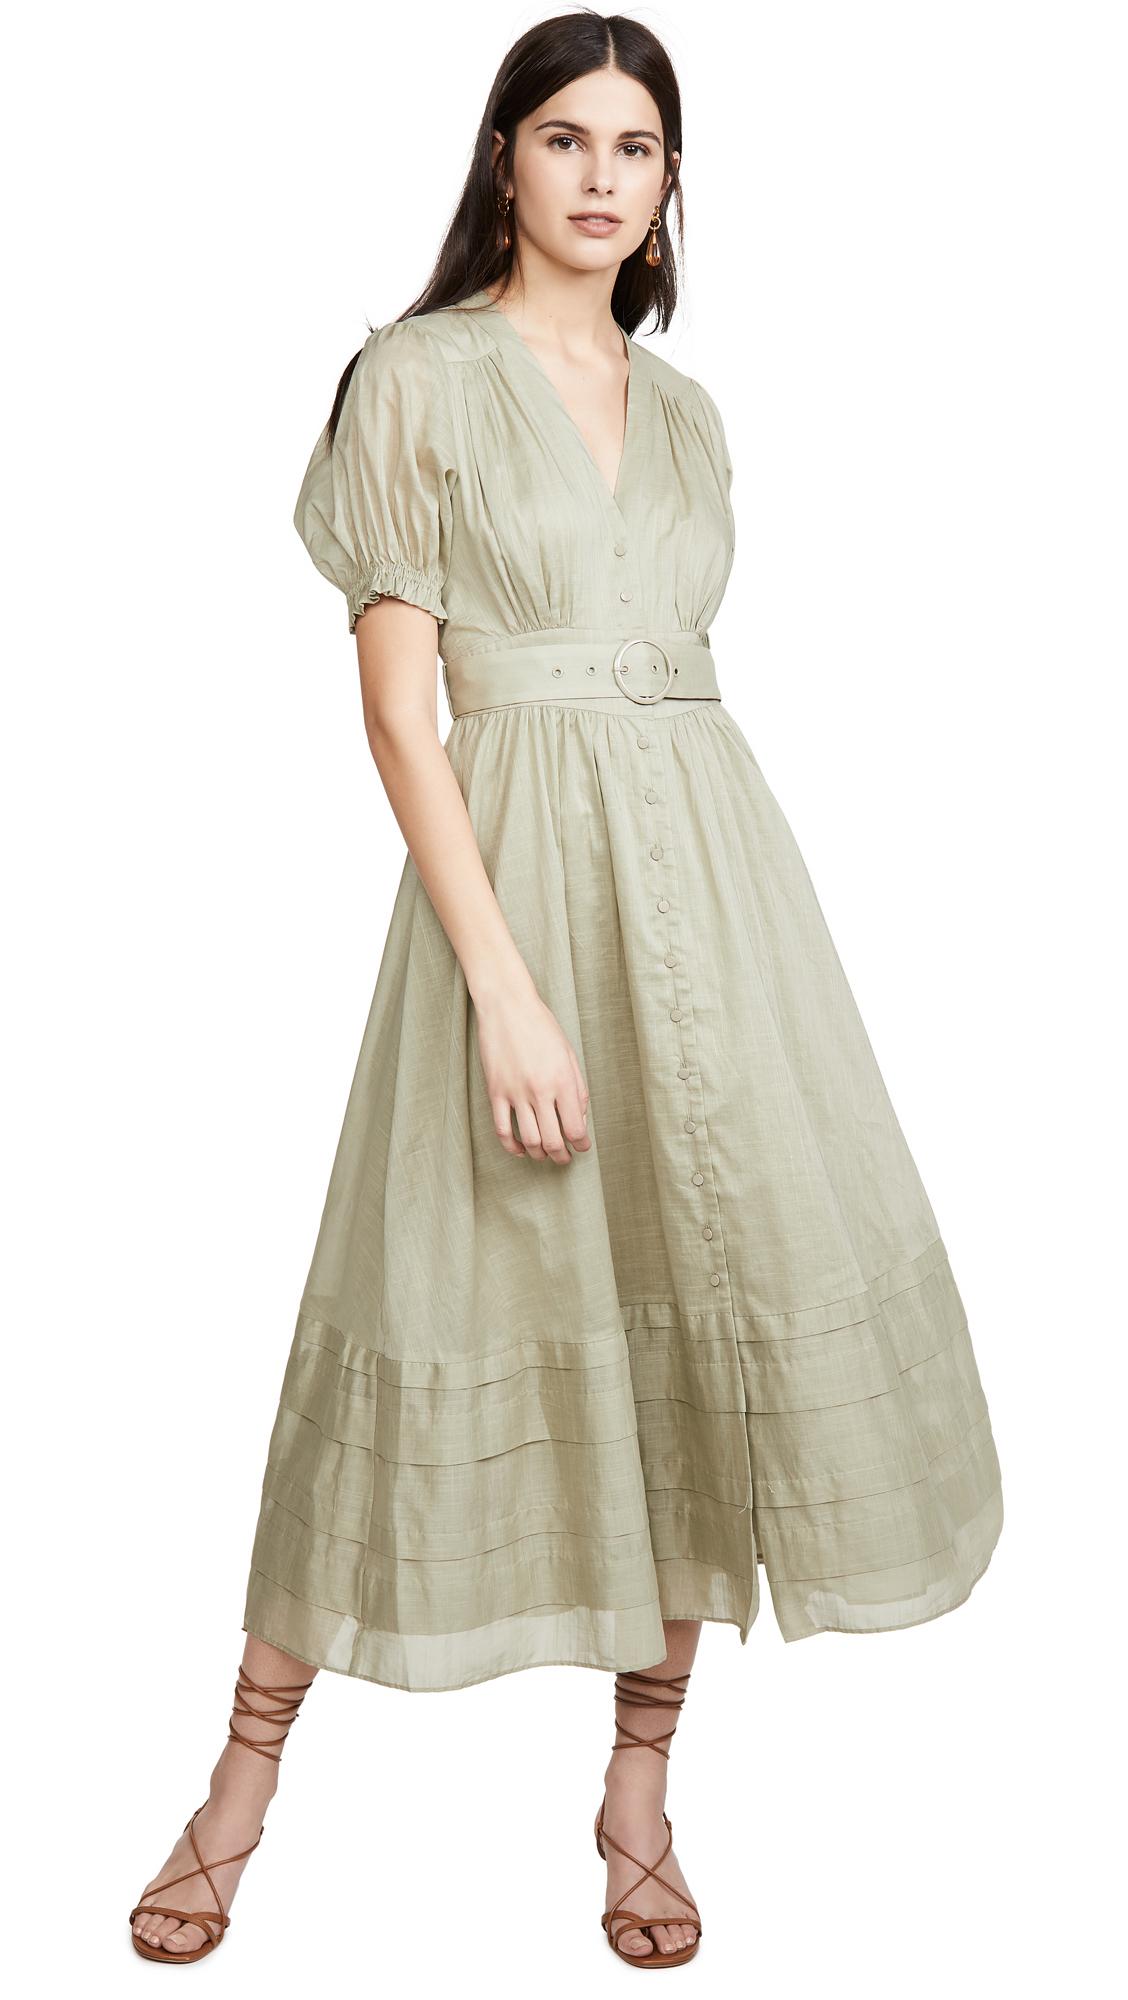 Steele Carmen Dress - 30% Off Sale